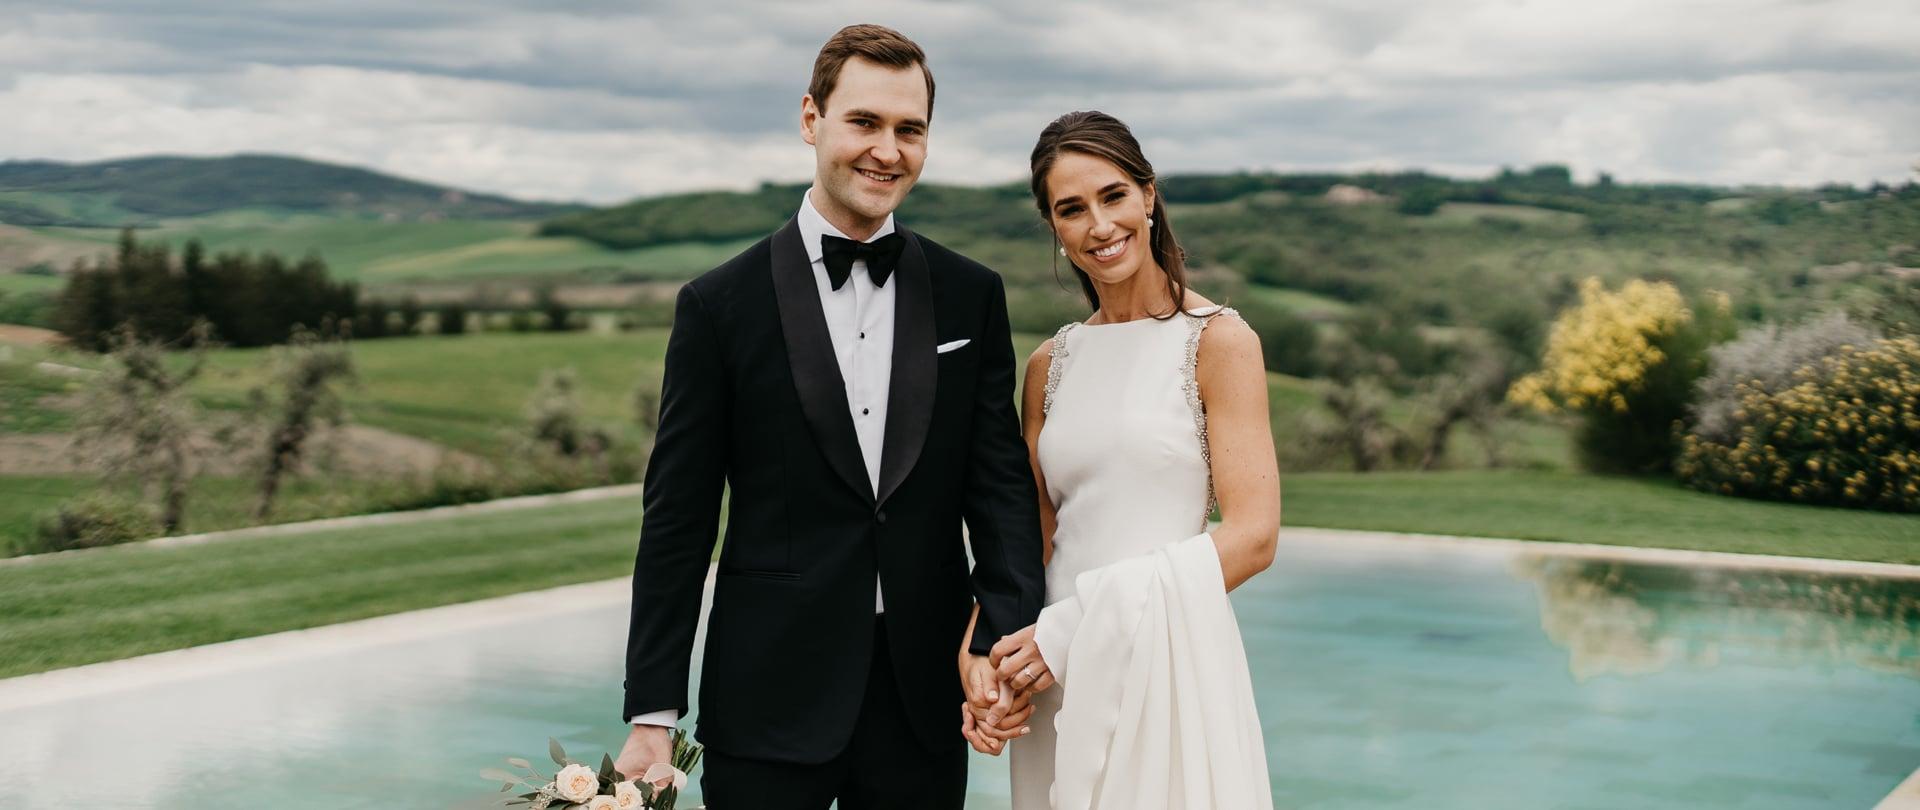 Laura & Myles Wedding Video Filmed at Tuscany, Italy